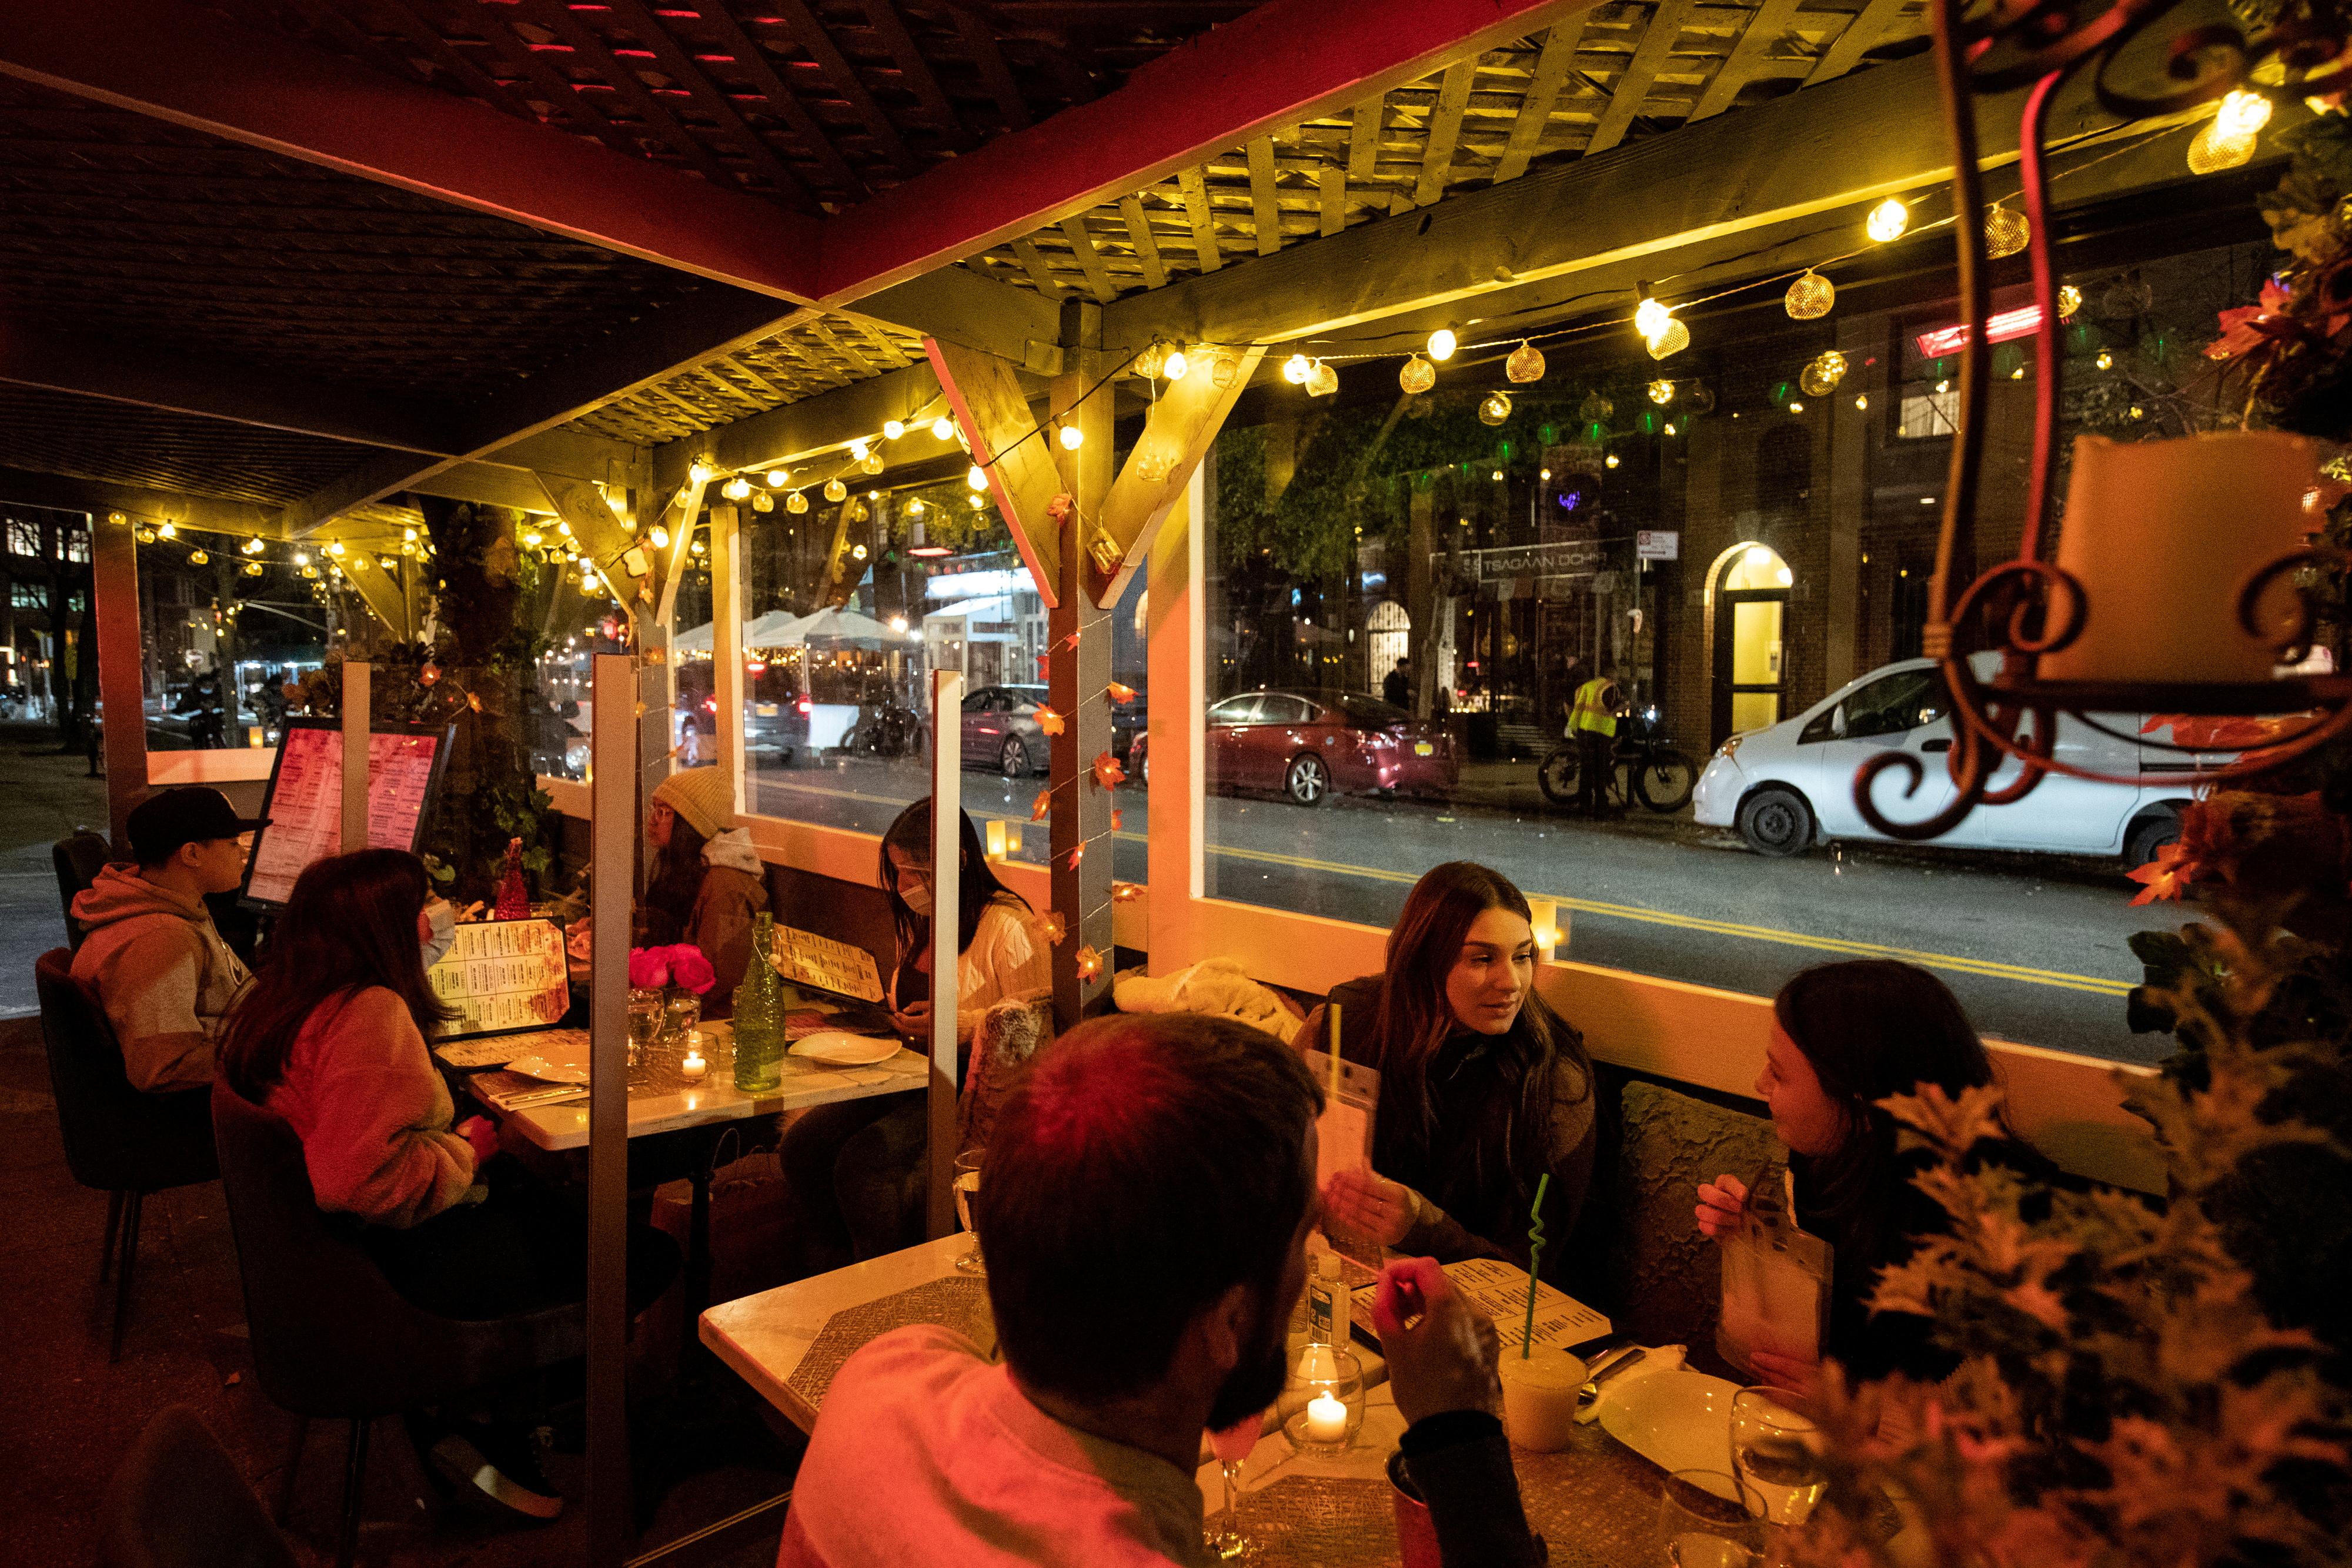 People enjoy outdoor dining at the Sveta restaurant as the spread of the coronavirus disease (COVID-19) continues, in New York City, New York, U.S., November 21, 2020. REUTERS/Jeenah Moon/File Photo